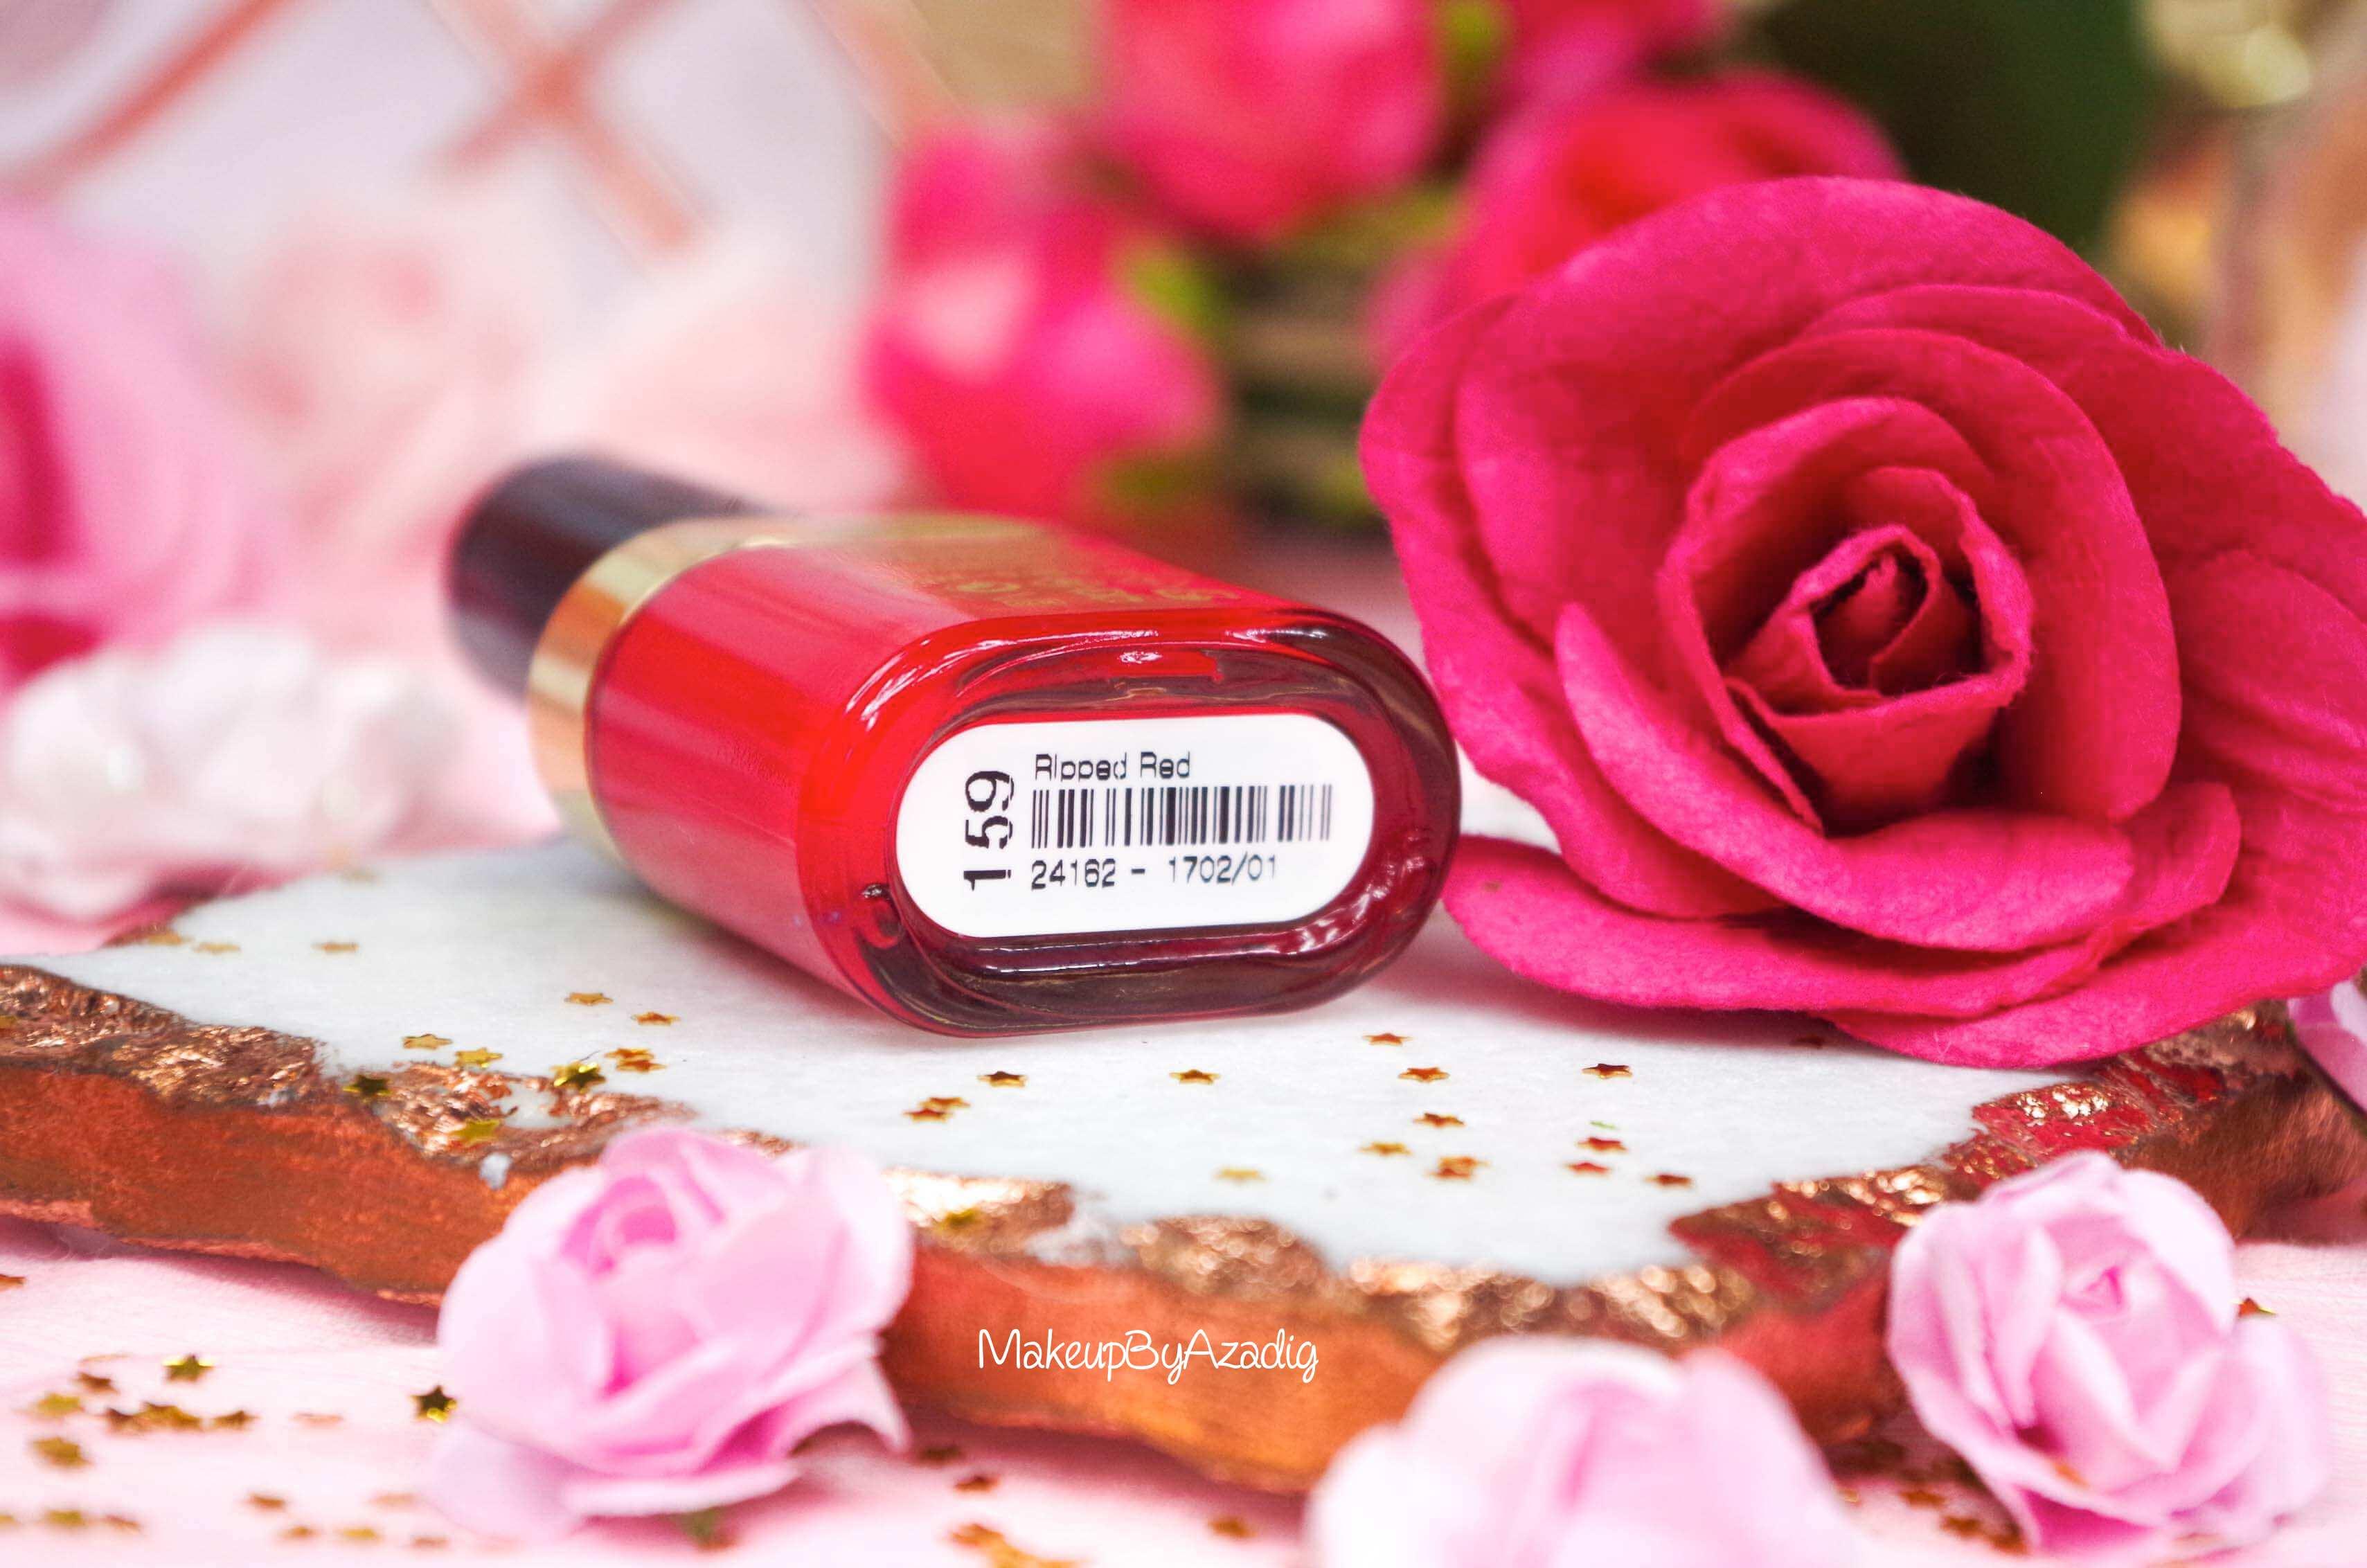 vernis-tendances-2018-printemps-automne-hiver-pronails-influencer-makeupbyazadig-rouge-bleu-nude-coat-rose